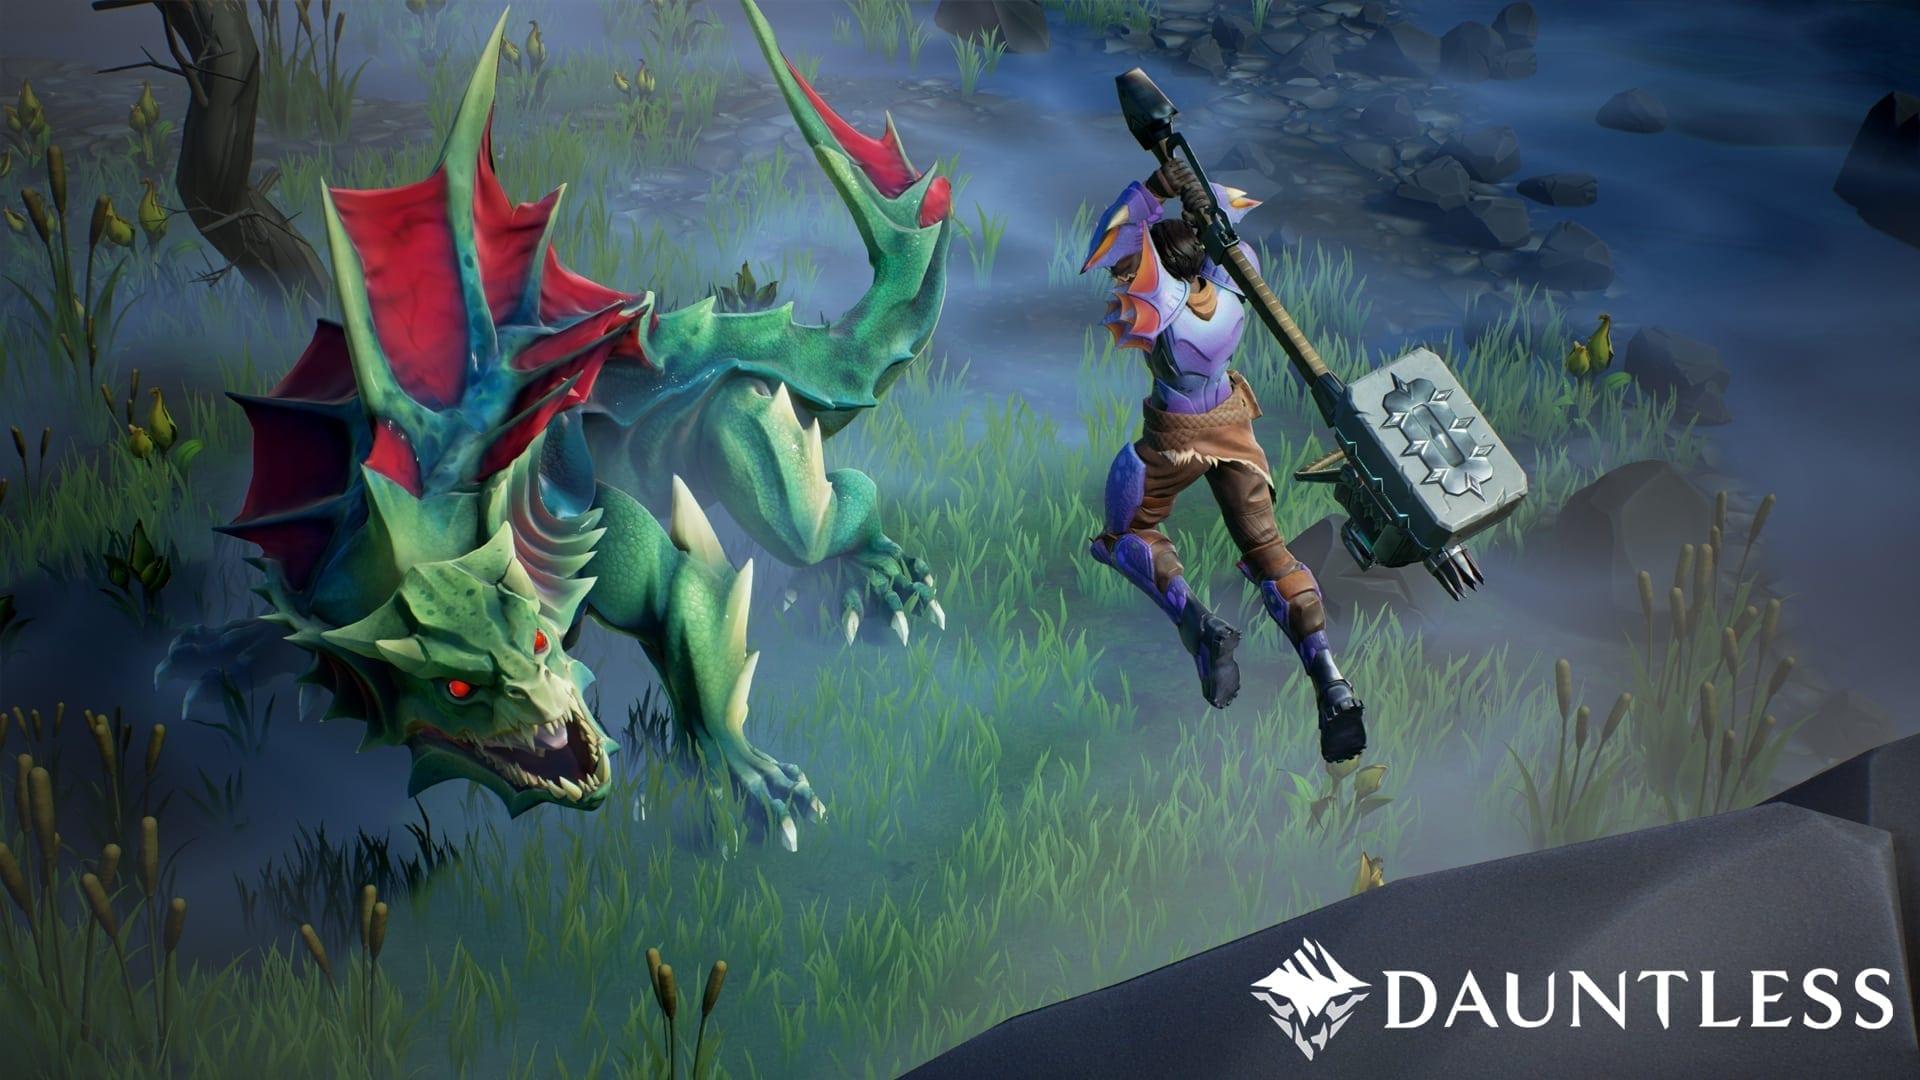 dauntless-game-screenshot-2